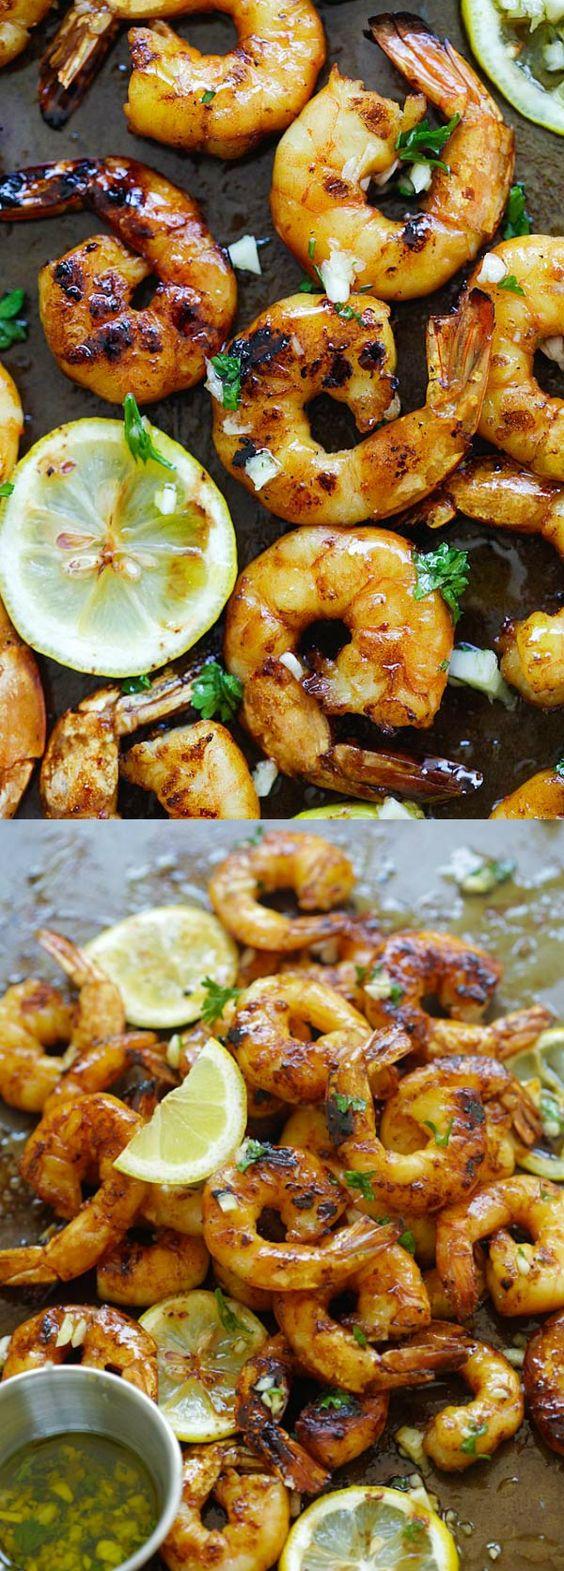 Grilled Honey Cajun Shrimp – amazing grilled shrimp with honey Cajun seasonings. Sweet, spicy, the best and easiest Cajun shrimp ever   rasamalaysia.com